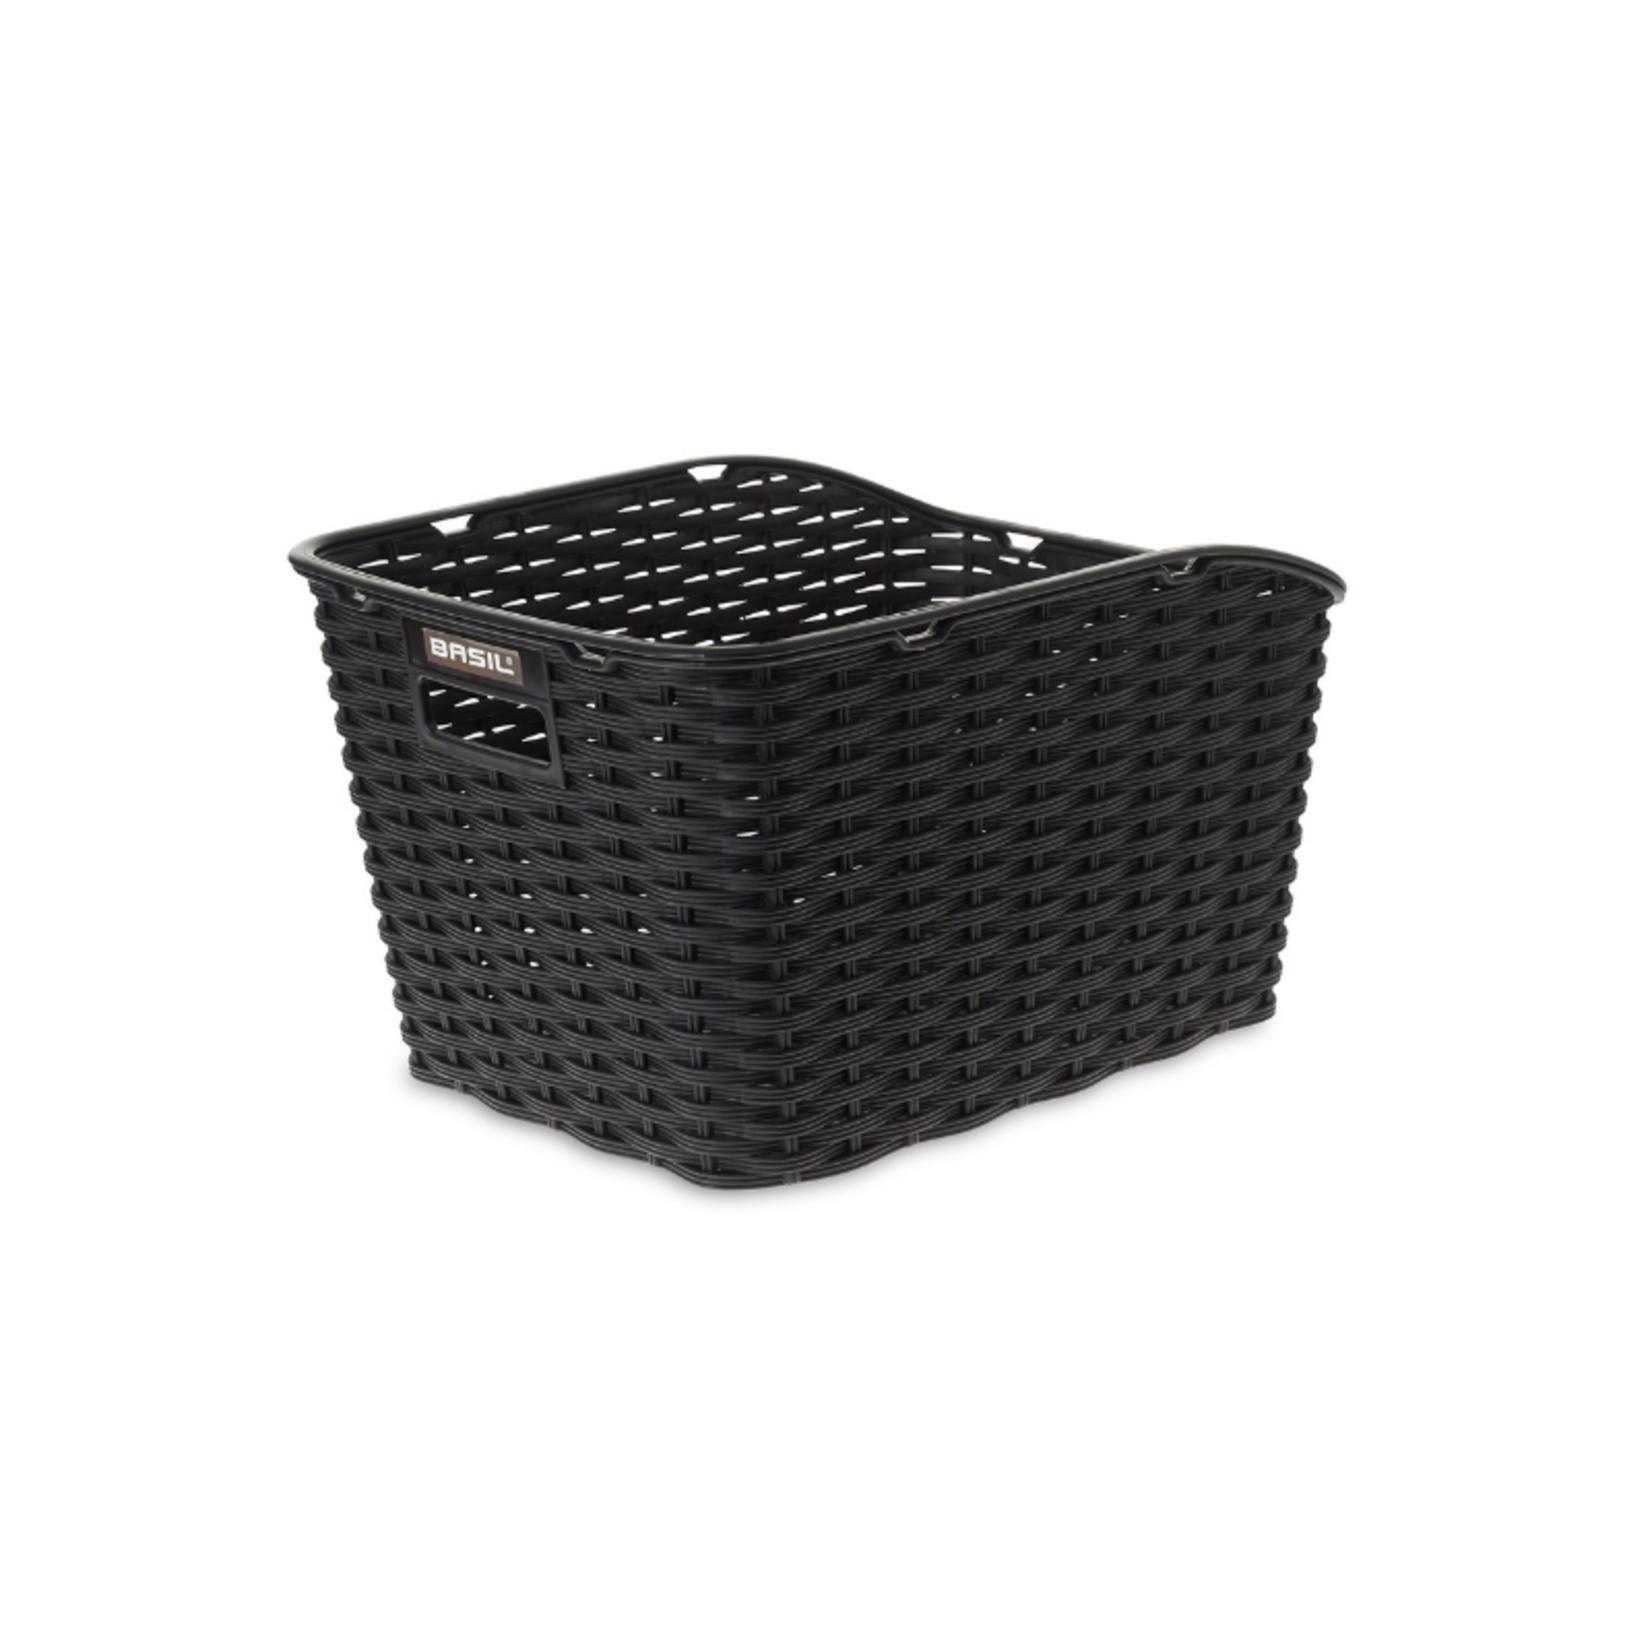 Basil Basil Weave Synthetic Rear Basket Black